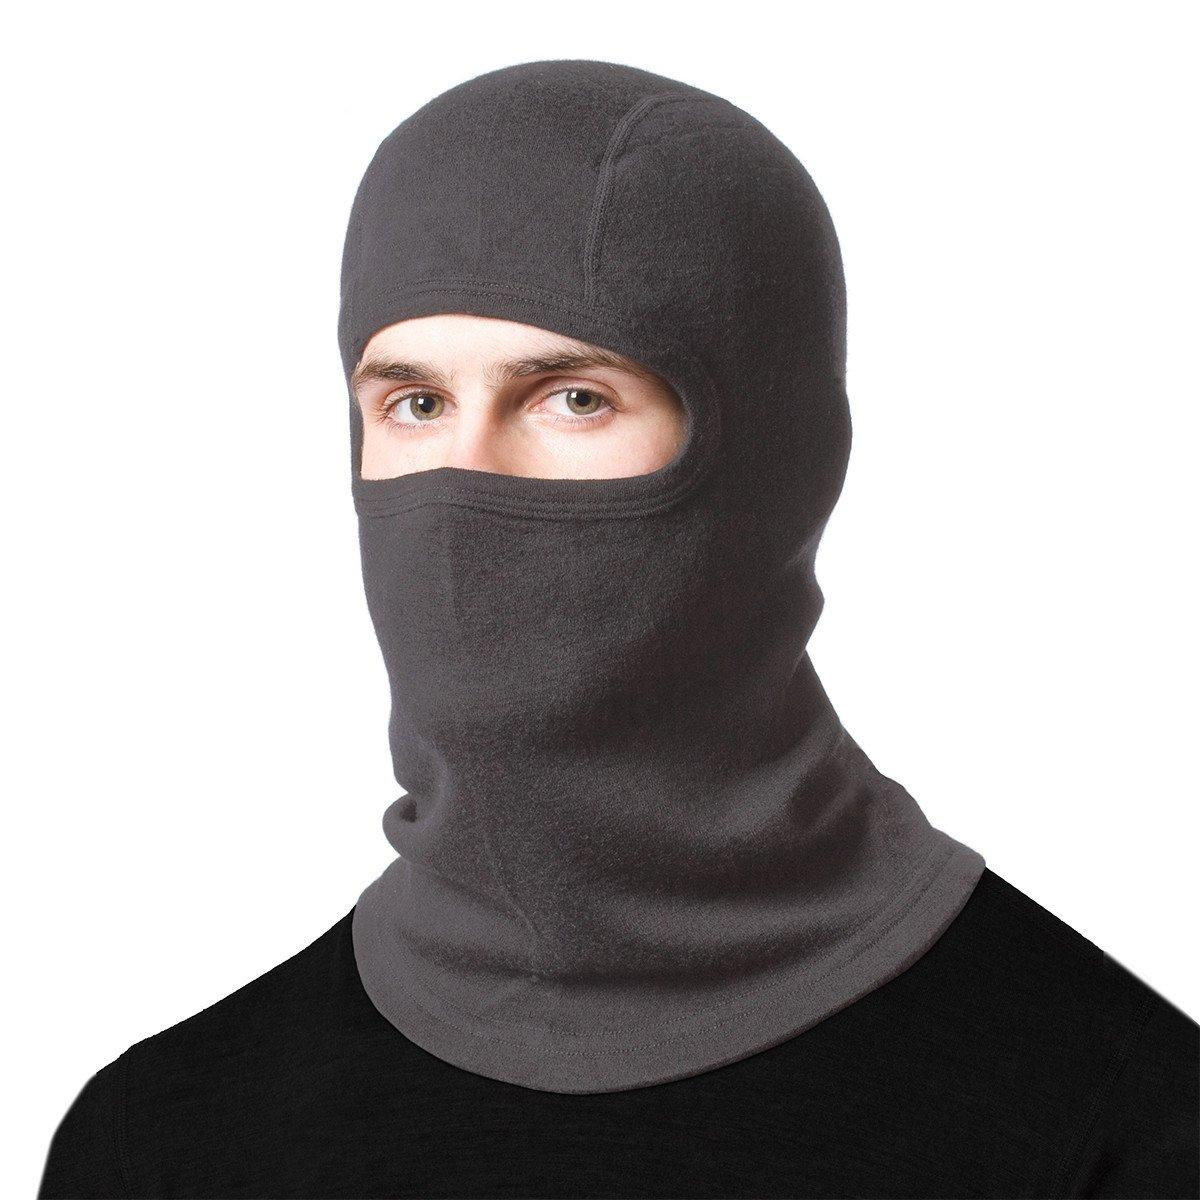 Minus33 Merino Wool Clothing Unisex Midweight Wool Balaclava, Charcoal Grey, One Size